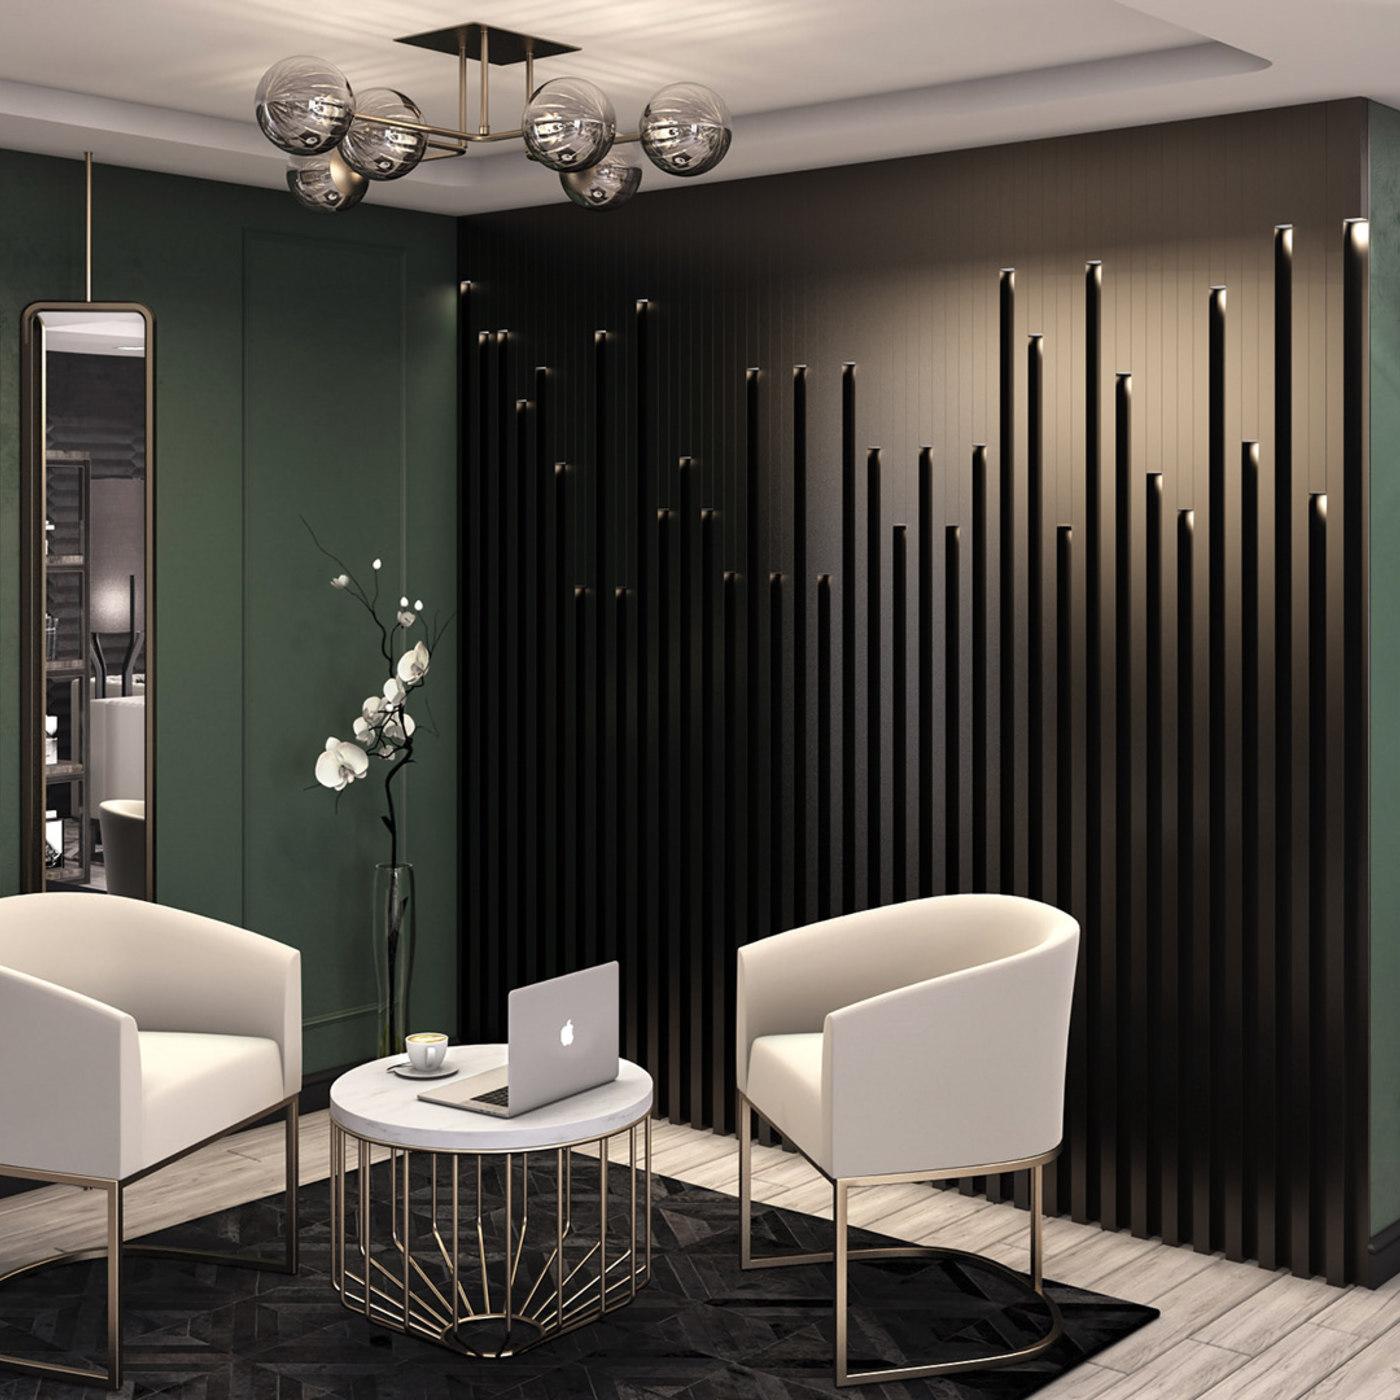 Sea-View Apartment in Green-Black